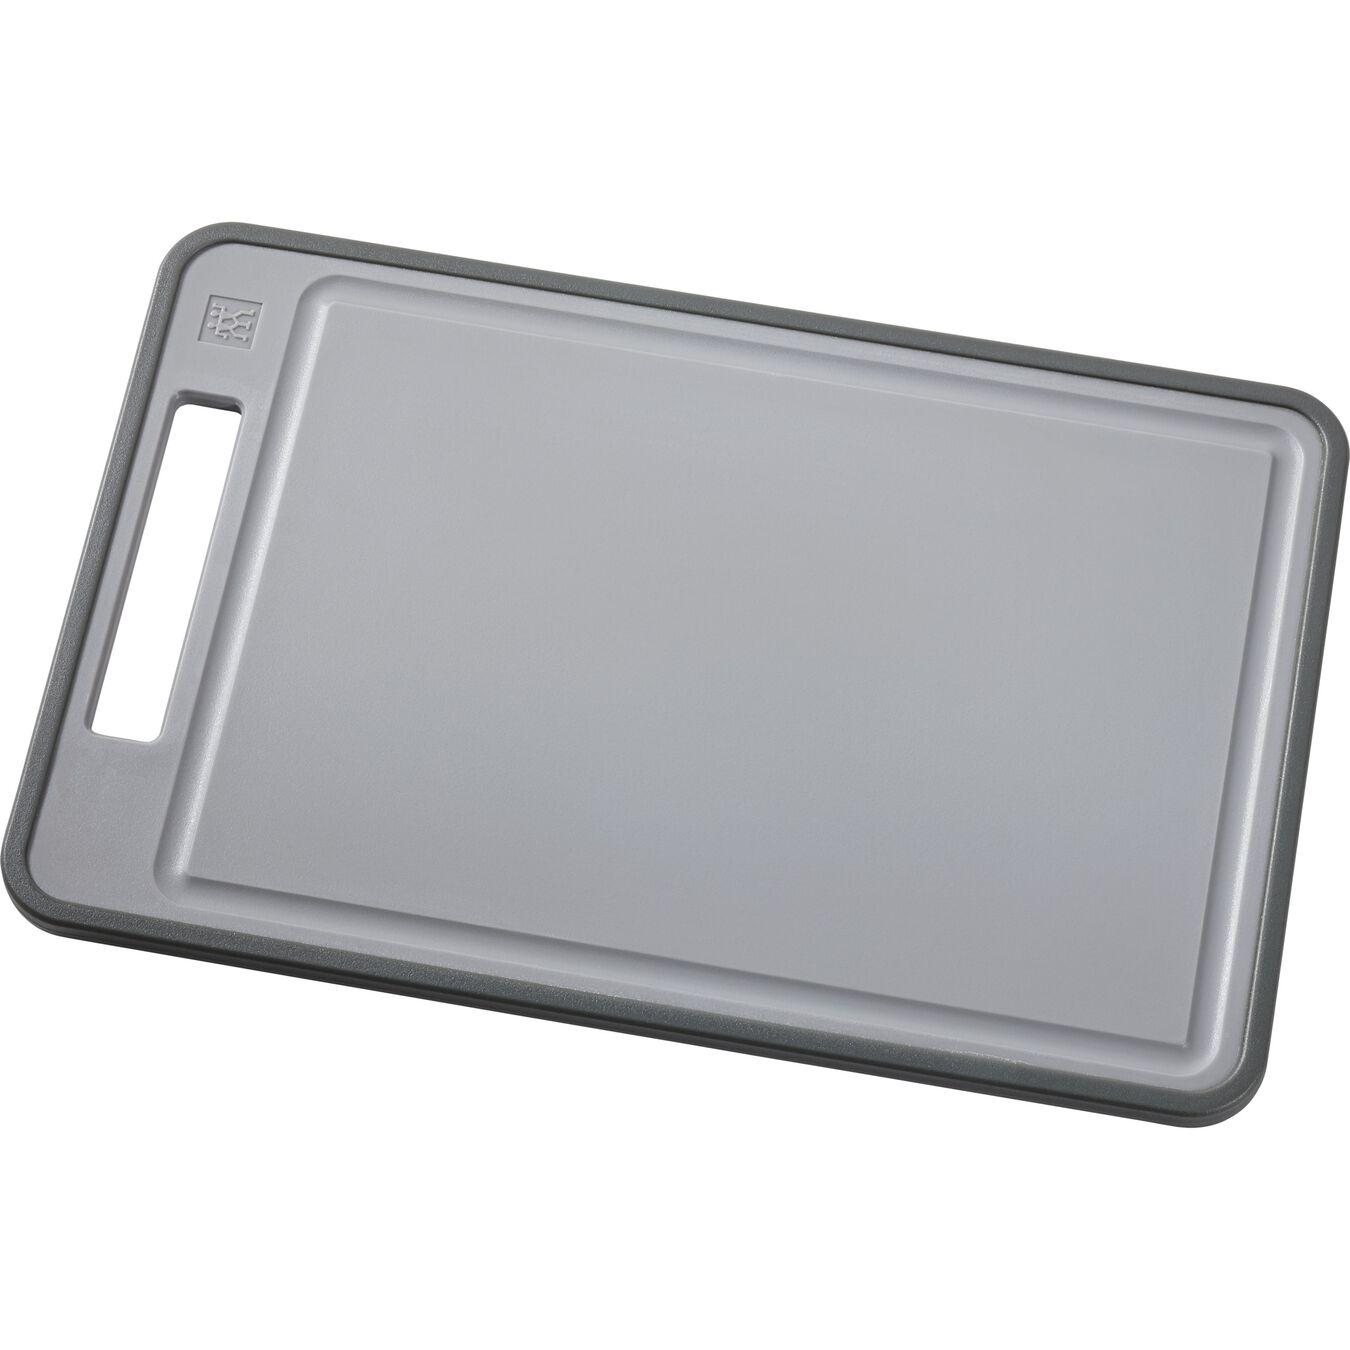 Tagliere - 39 cm x 25 cm, grigio,,large 1